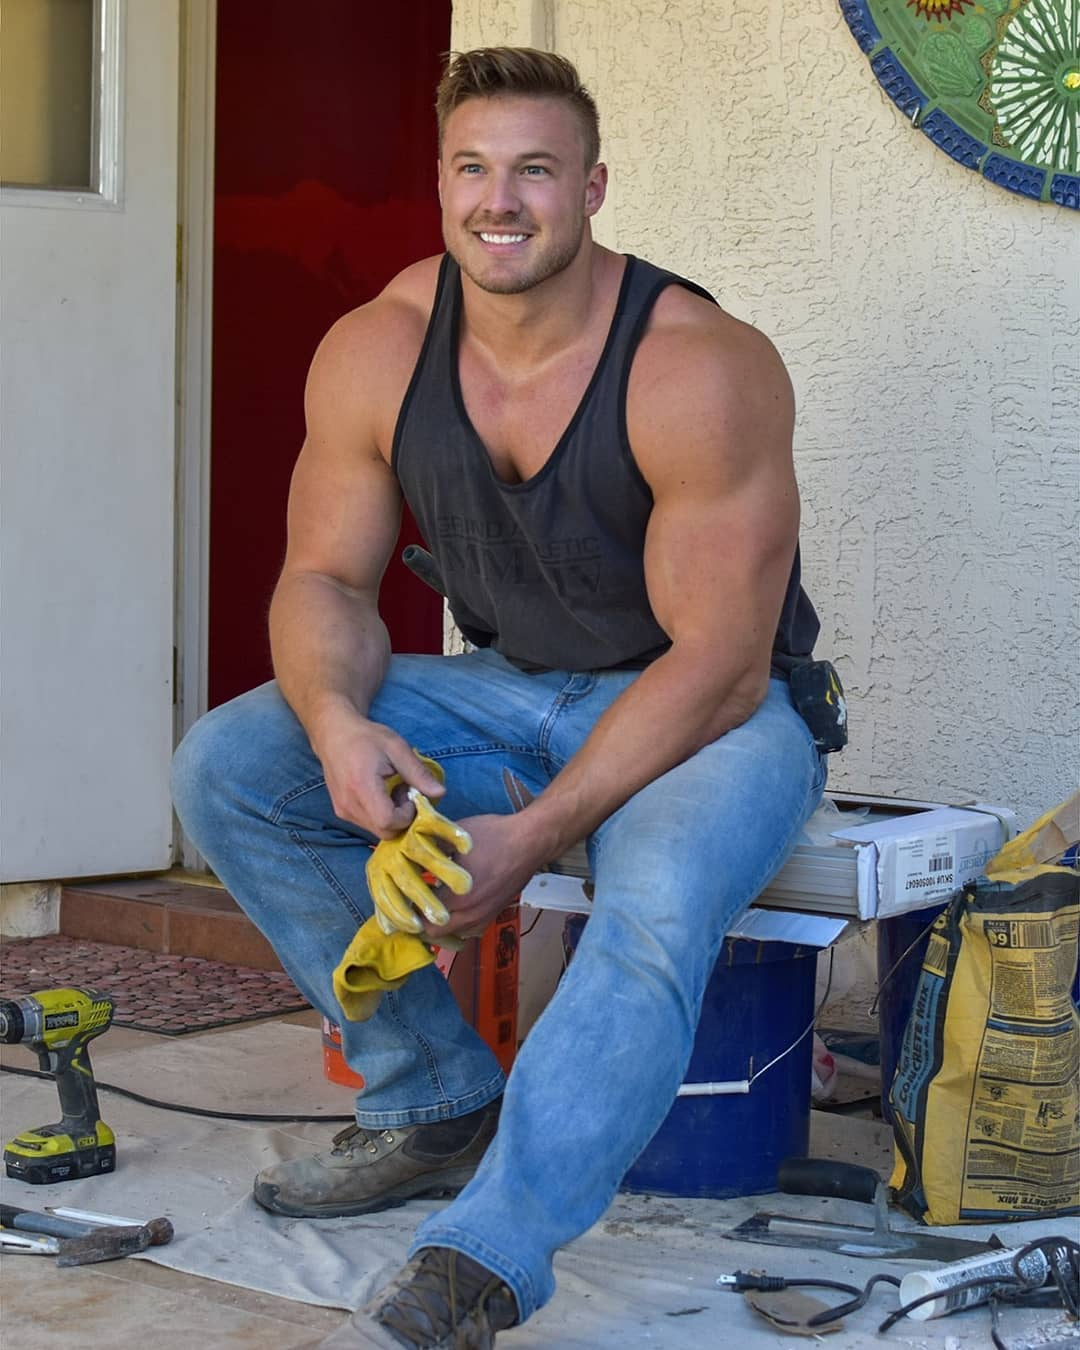 huge-blond-muscle-beefcake-male-hunk-hard-worker-smiling-jeans